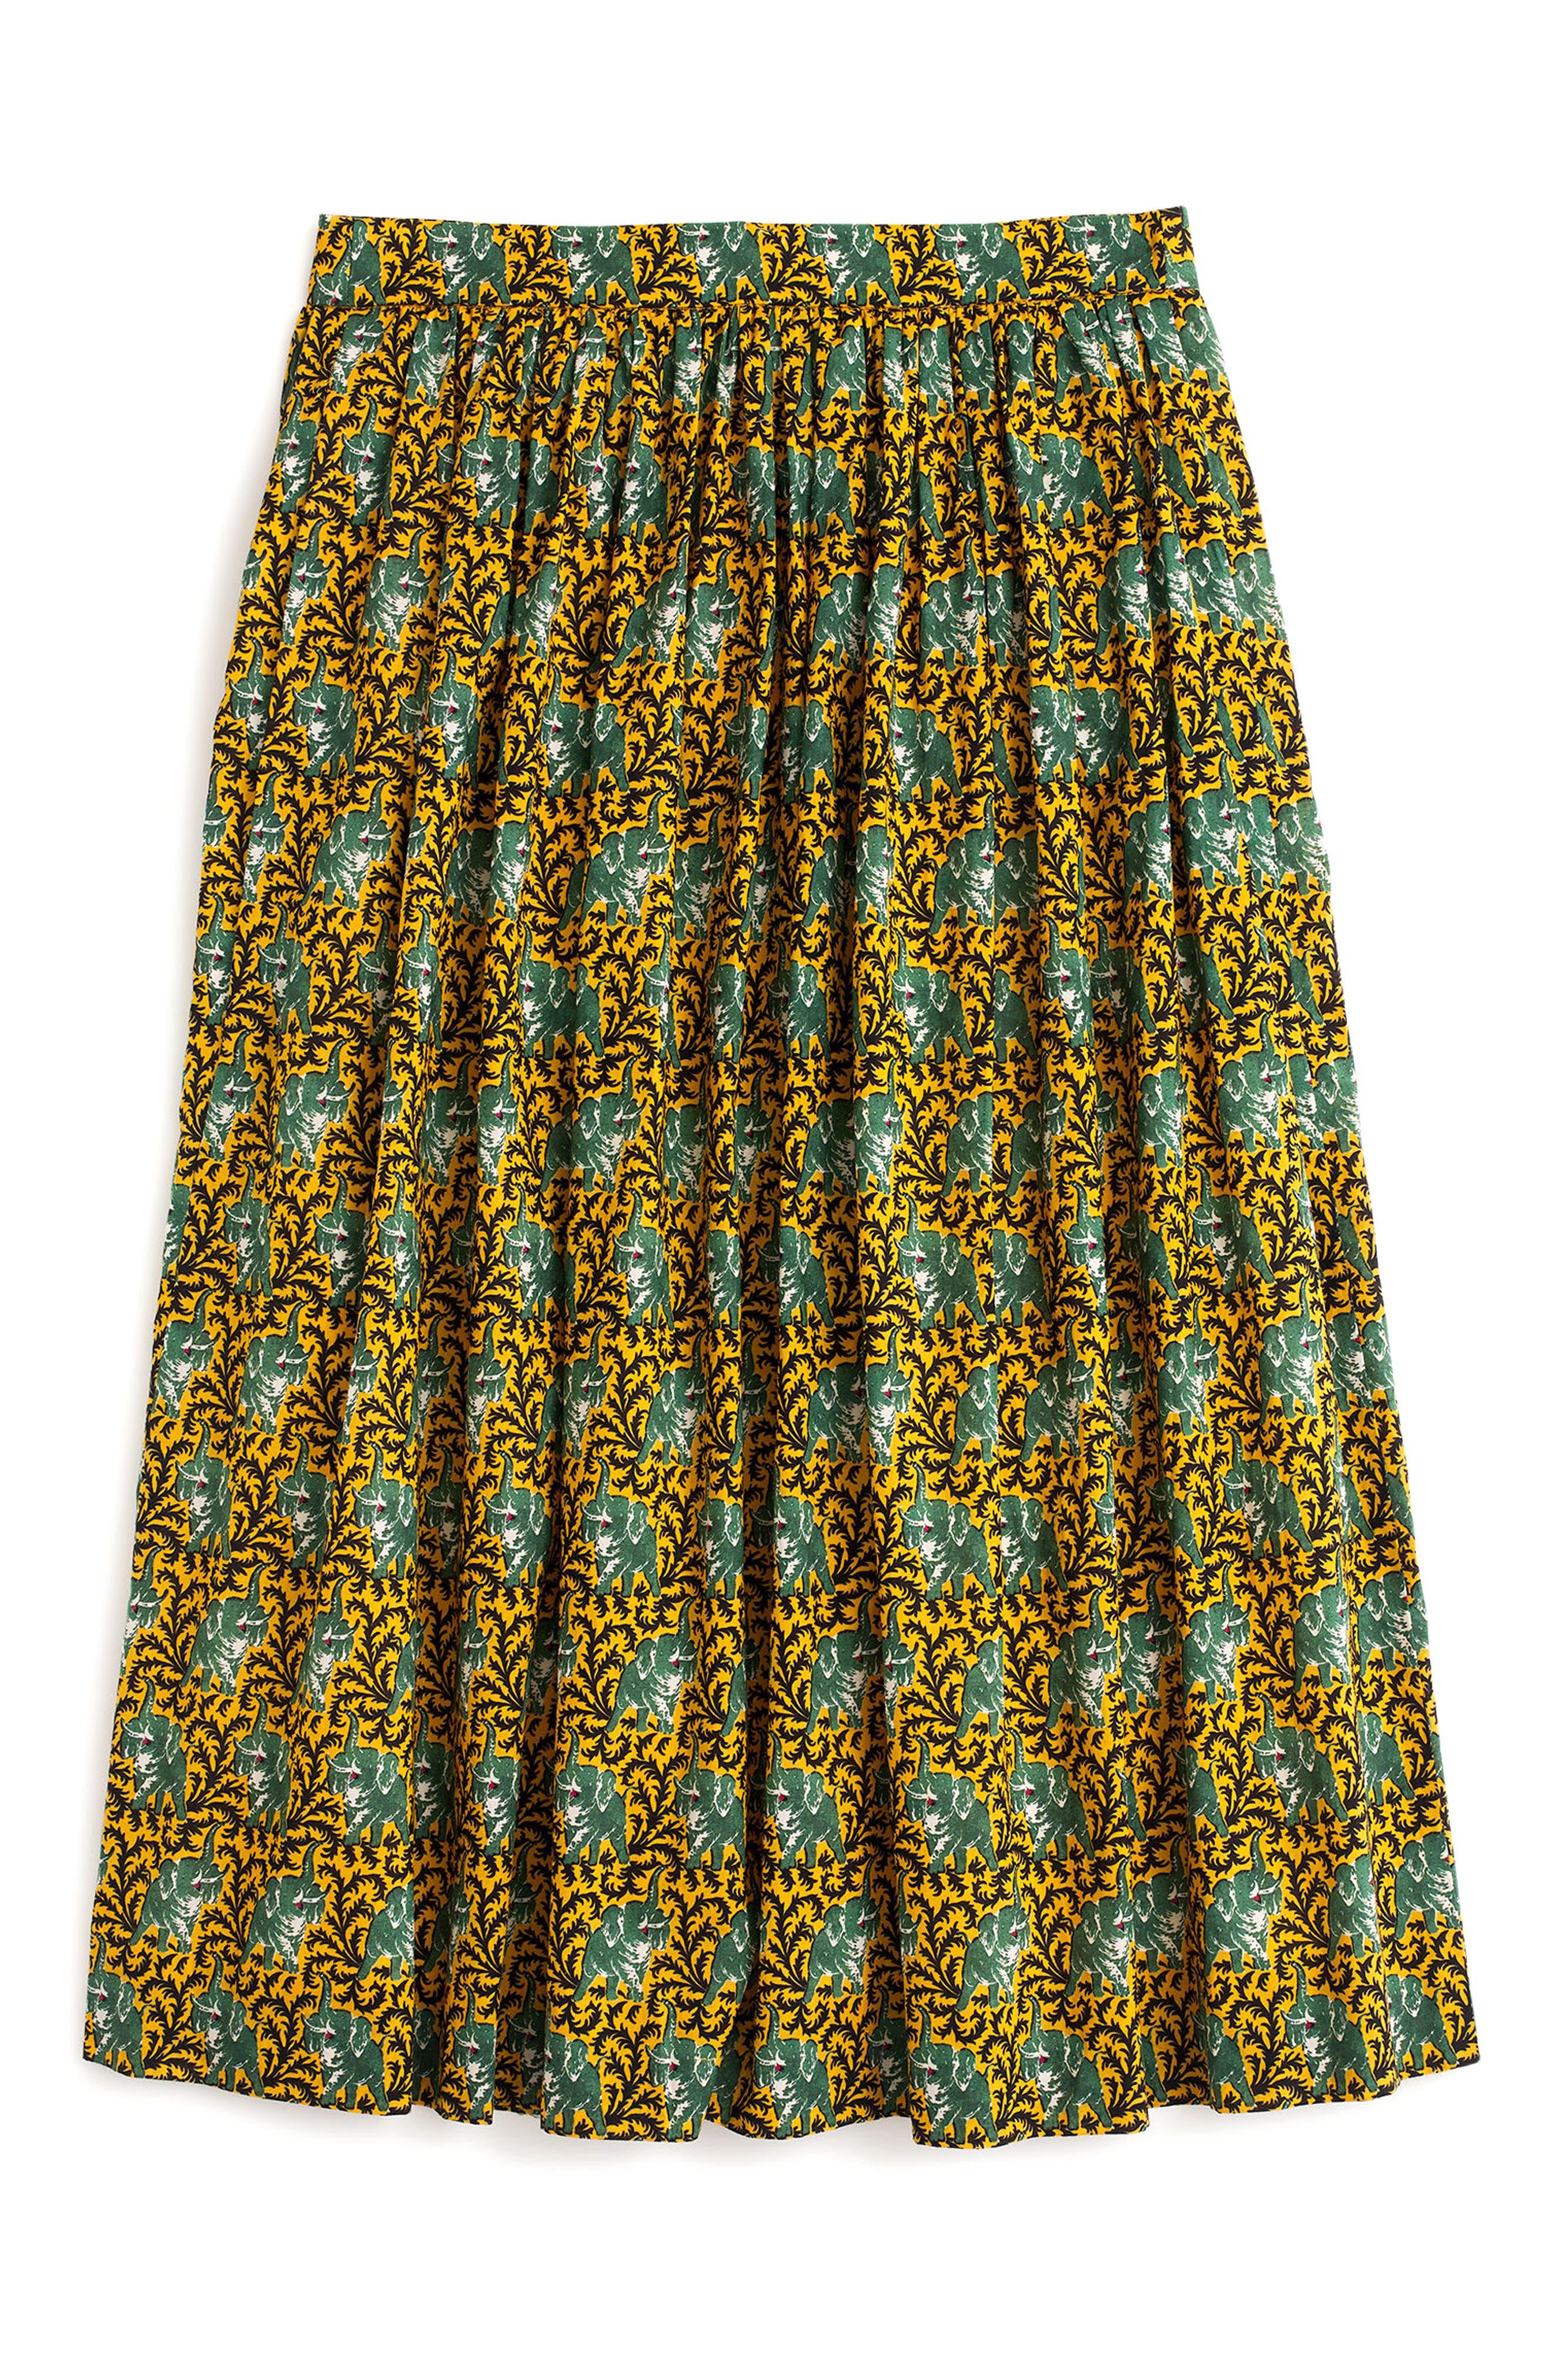 Elephant Print Skirt,                             Alternate thumbnail 4, color,                             209